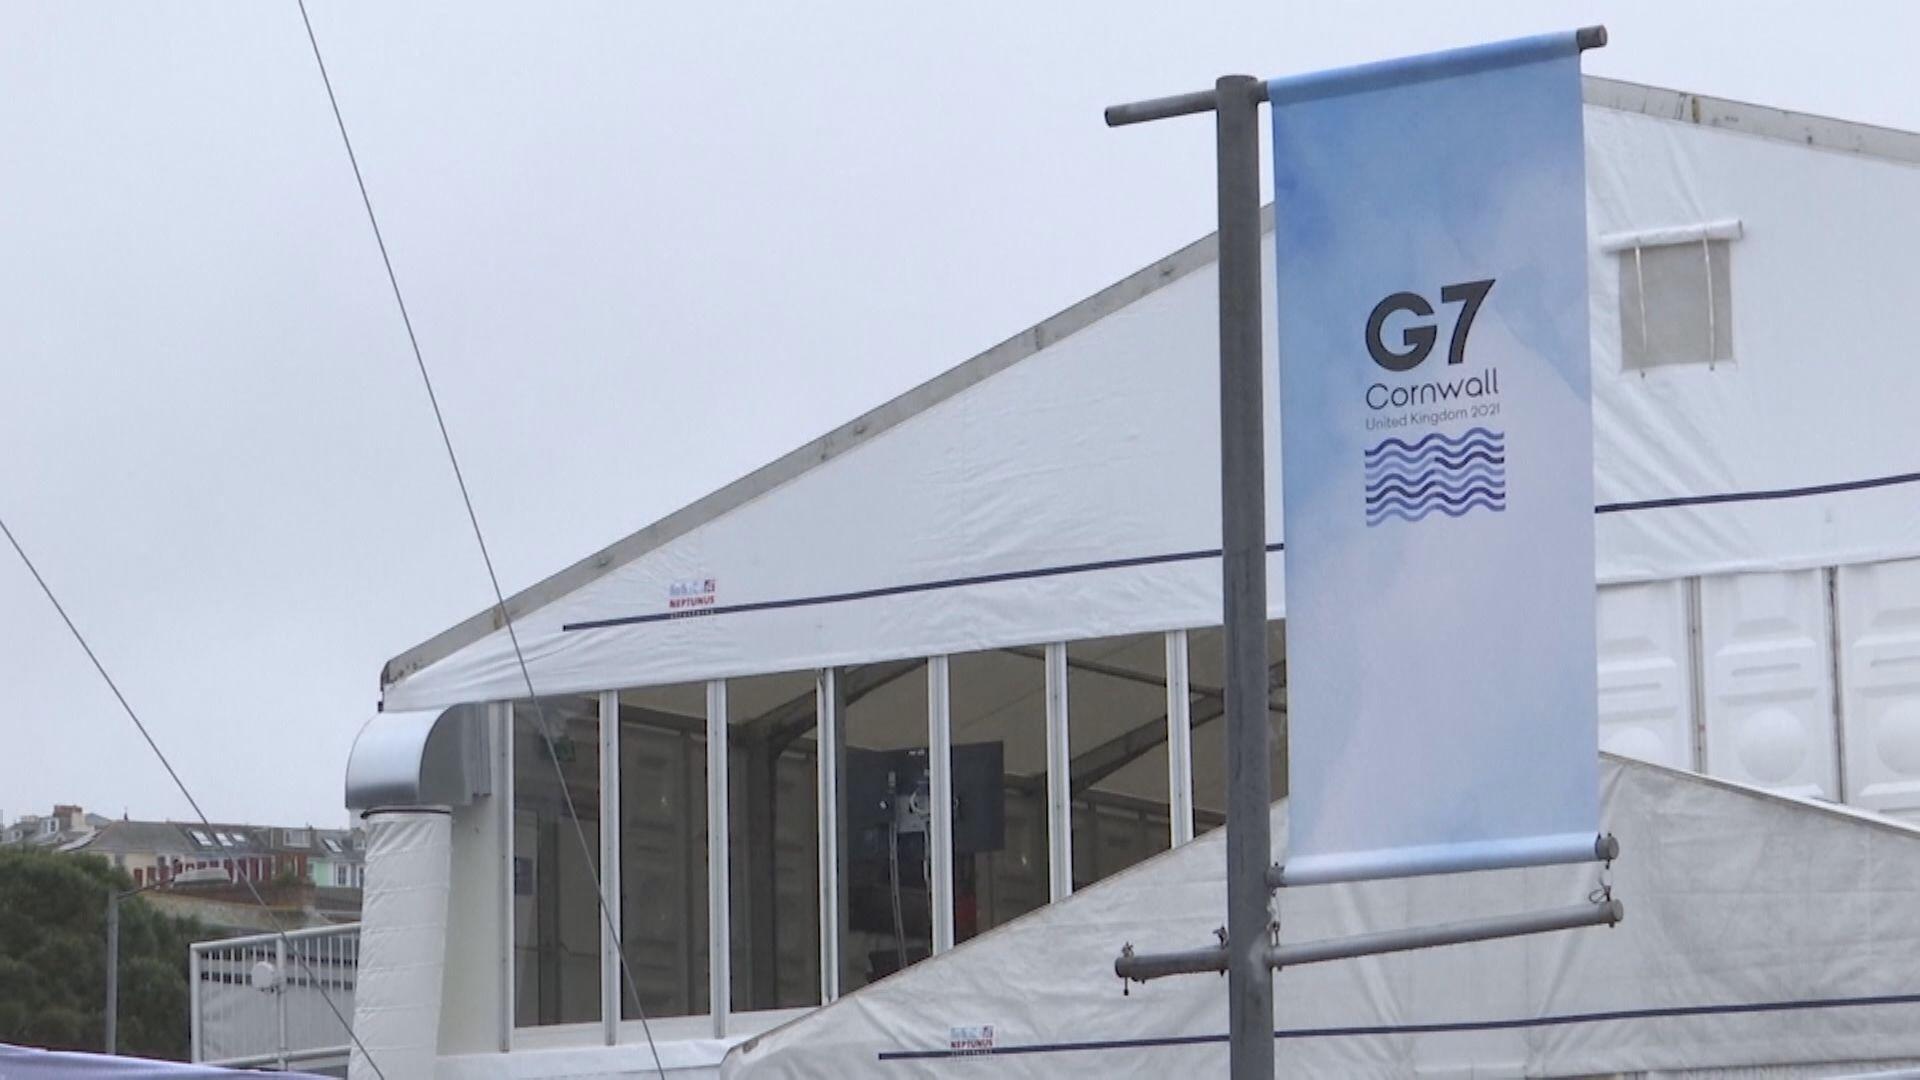 G7峰會!七國領袖聚首 傾抗疫、疫後經濟復甦等